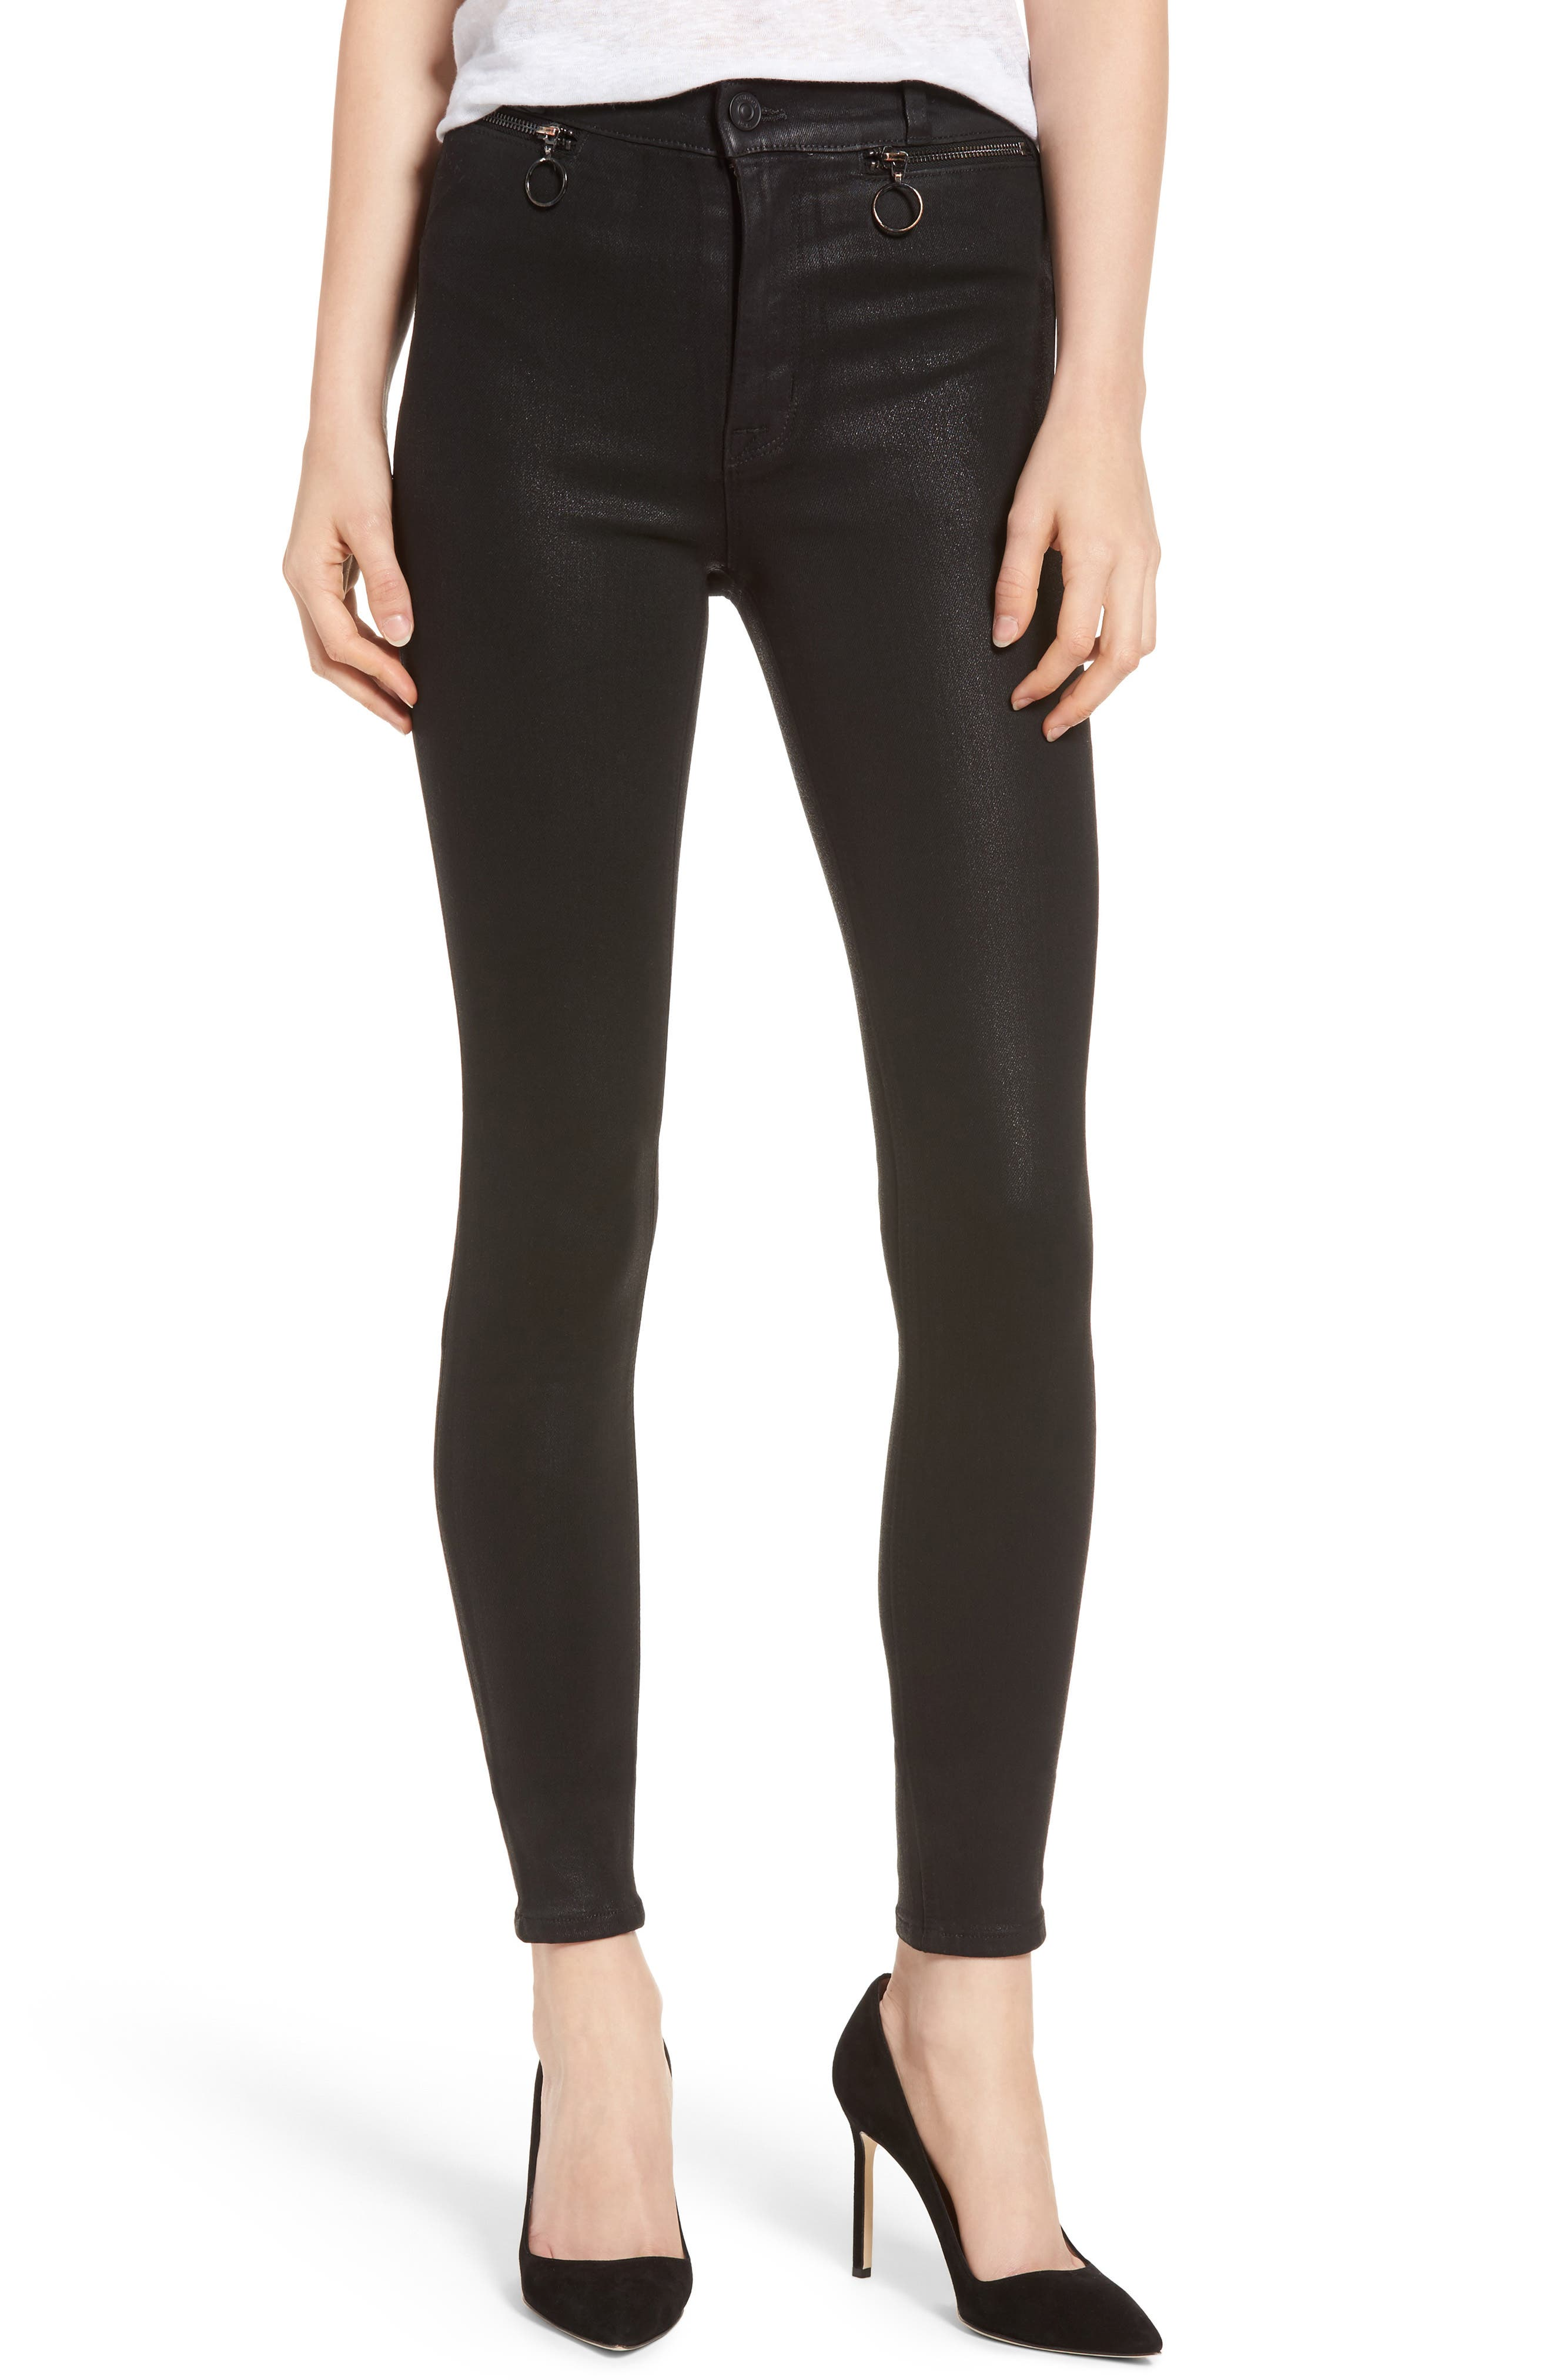 Kooper Coated Skinny Jeans,                             Main thumbnail 1, color,                             Black Coated